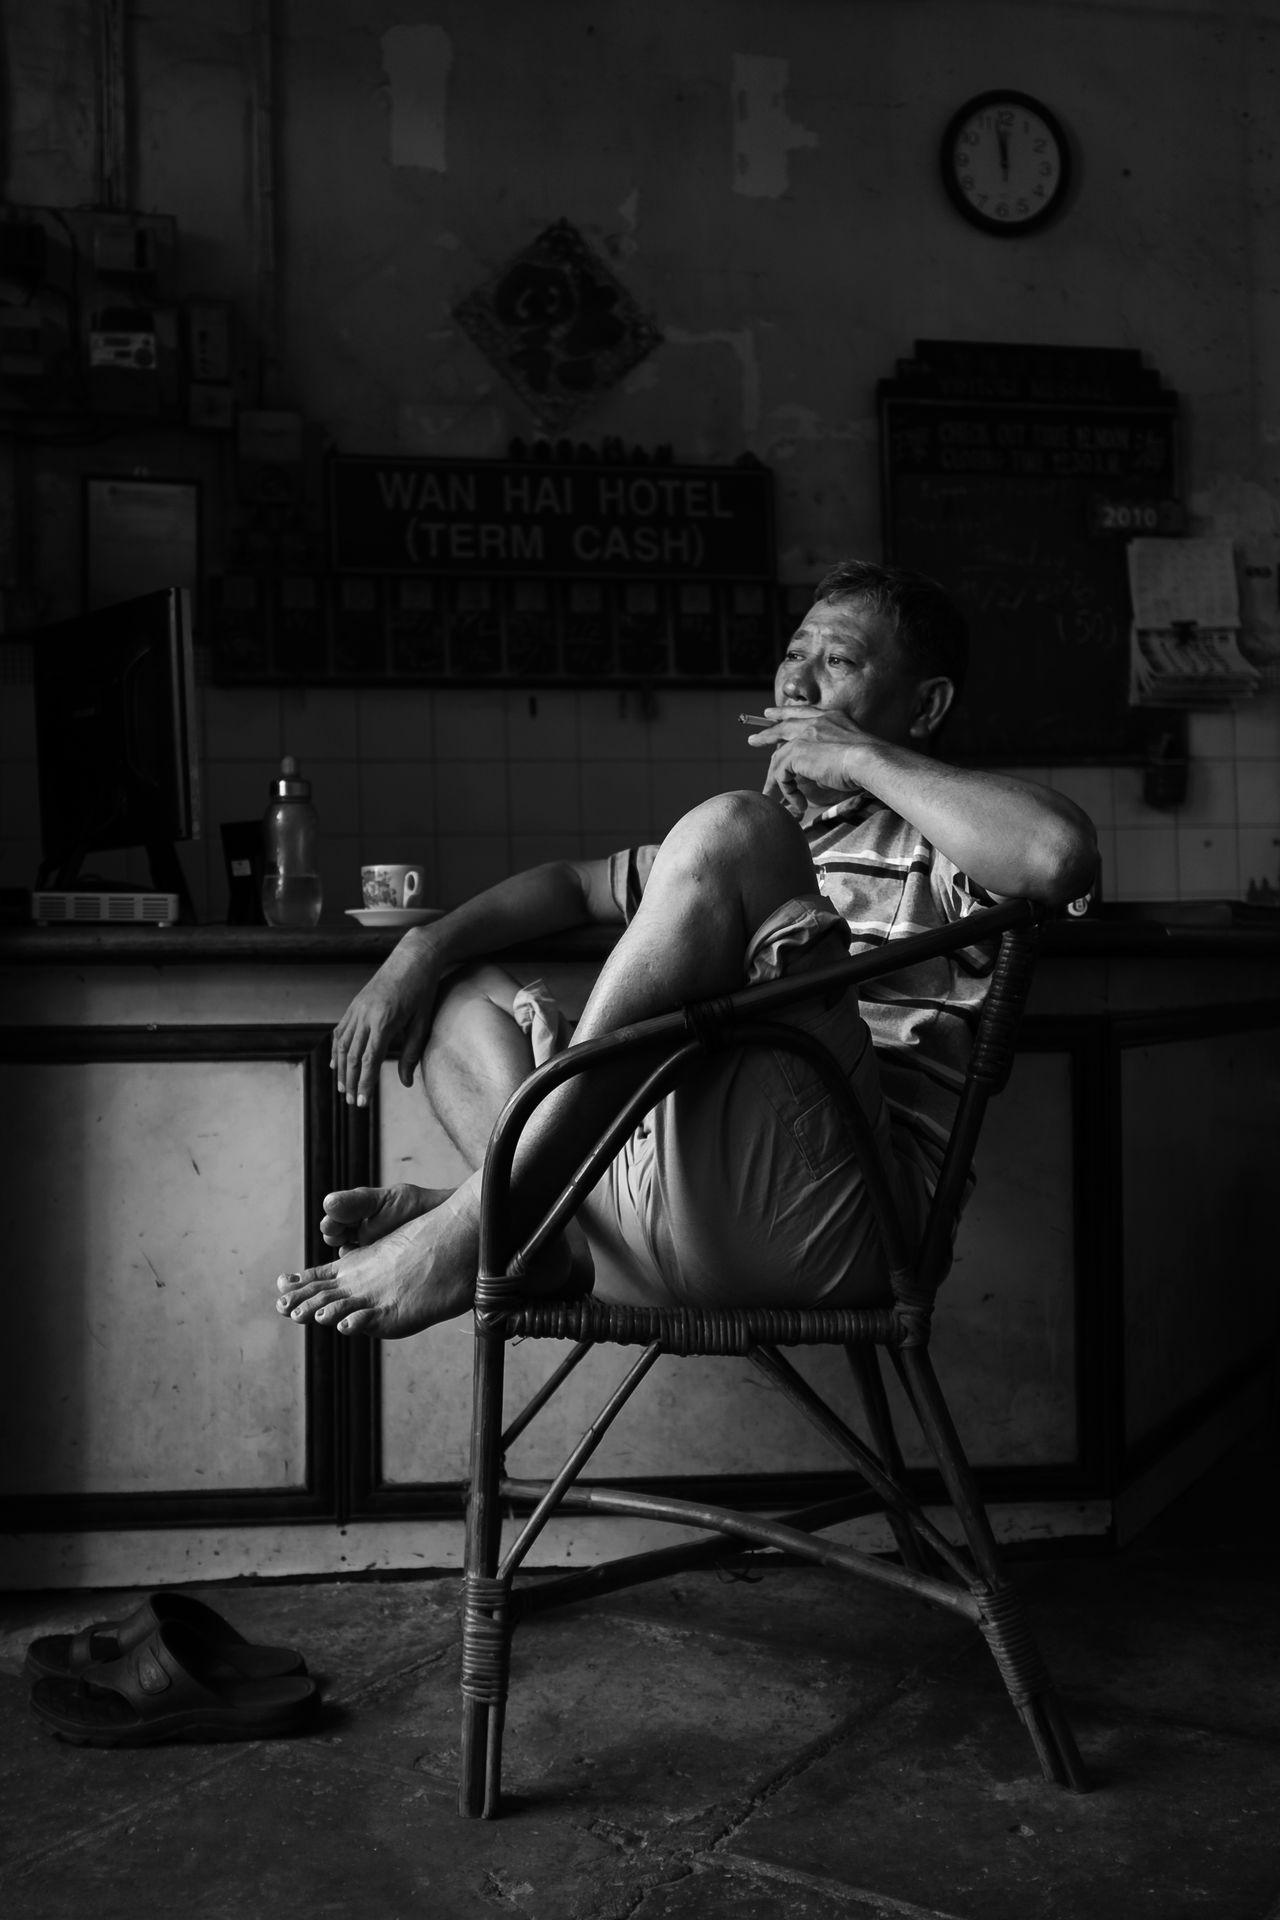 Georgetown, Penang February 12, 2016 Black And White Budjet Hotel Chinatown Daily Life Fujiflm X100S George Heritage Heritagebuilding Heritagesite Love Lane Mahfuz Jaffar Penang Street Street Life Street Photography Wan Hai Hotel